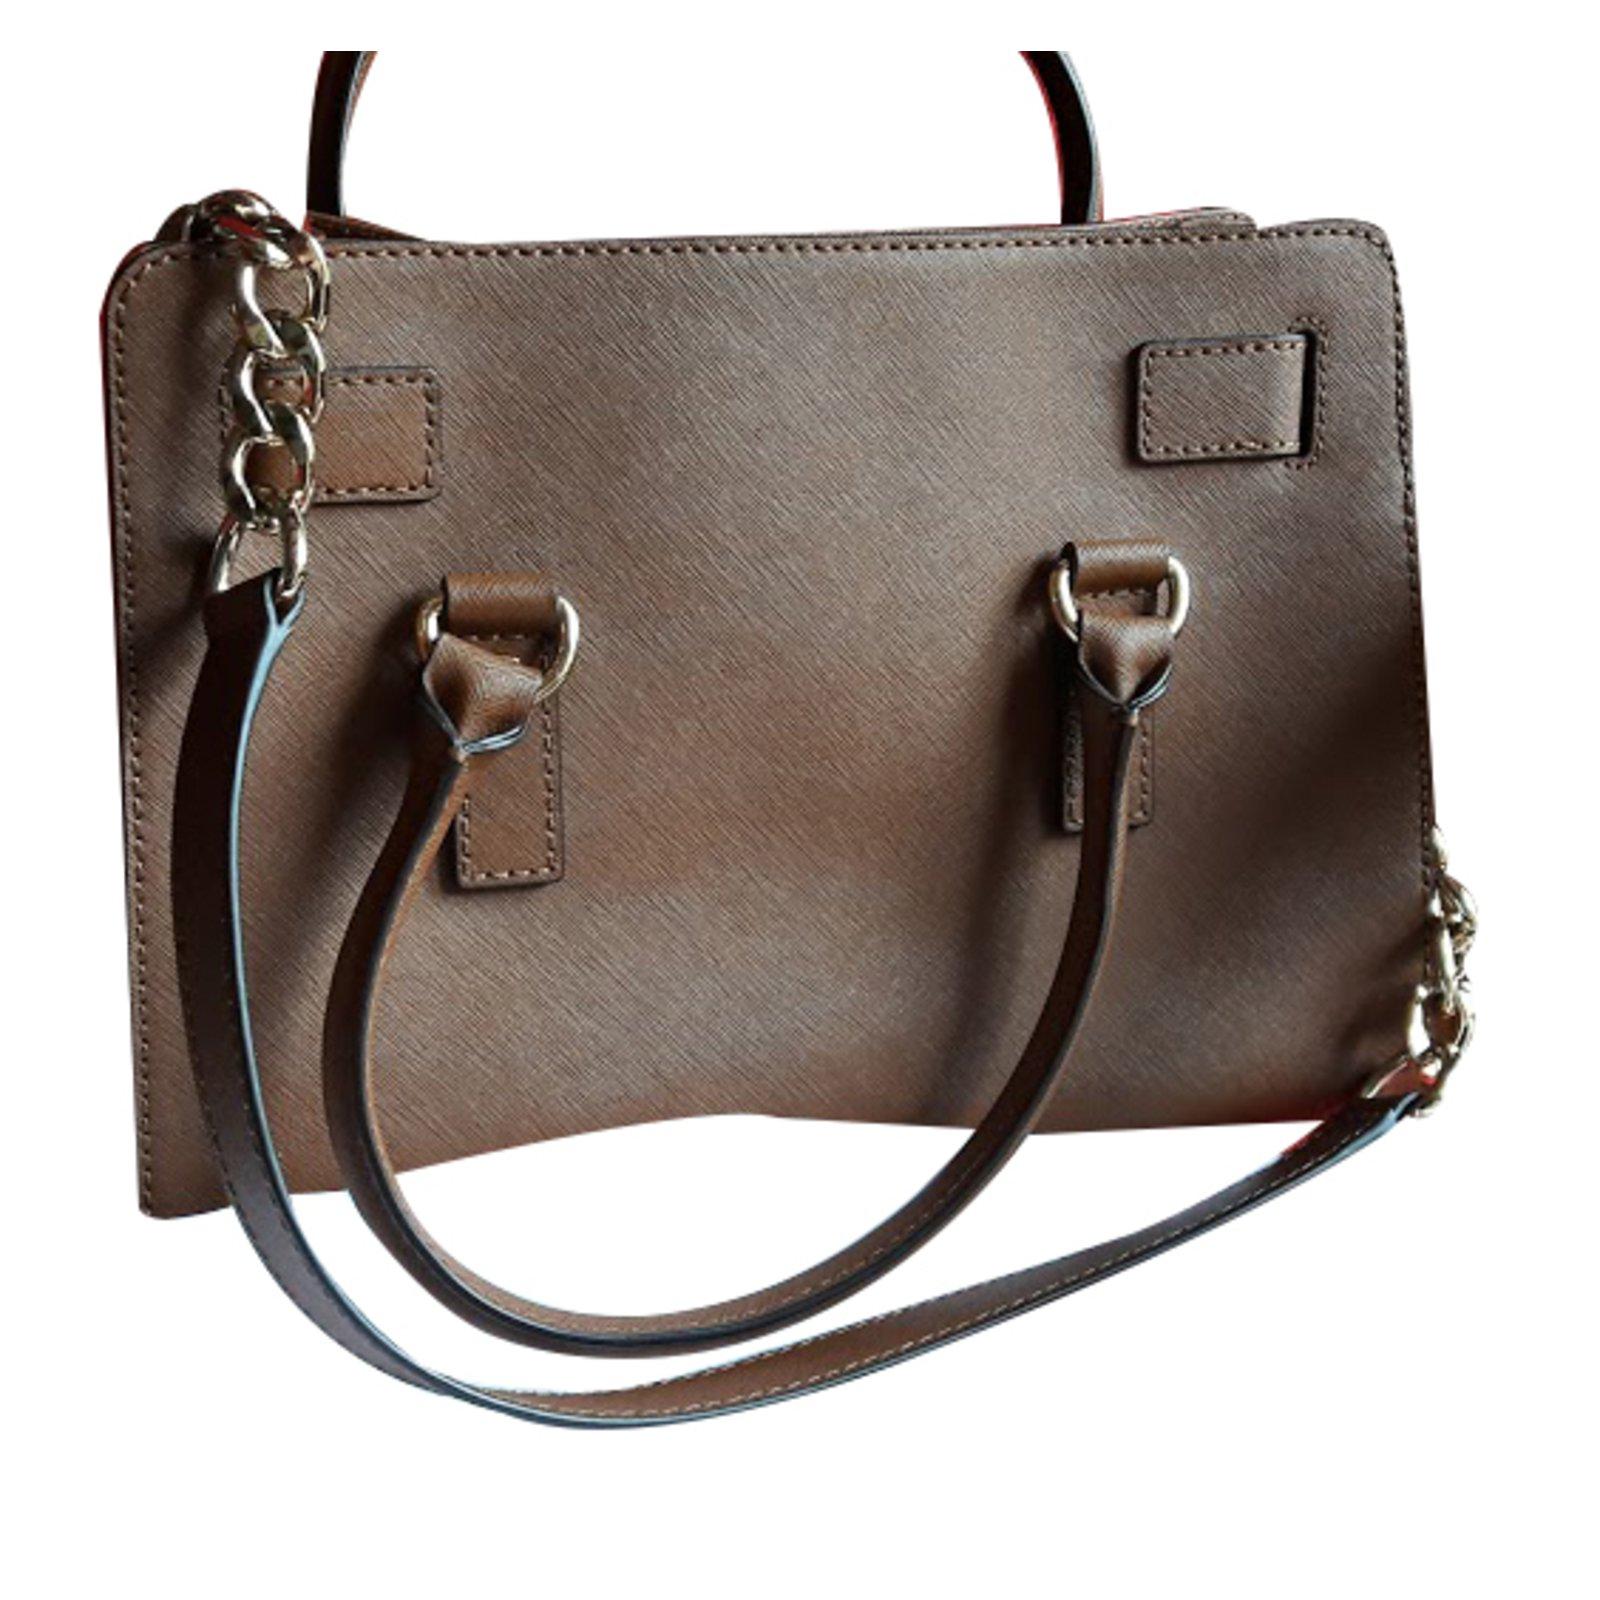 4993232afc8a Michael Kors Handbag Handbags Leather Caramel ref.26307 - Joli Closet